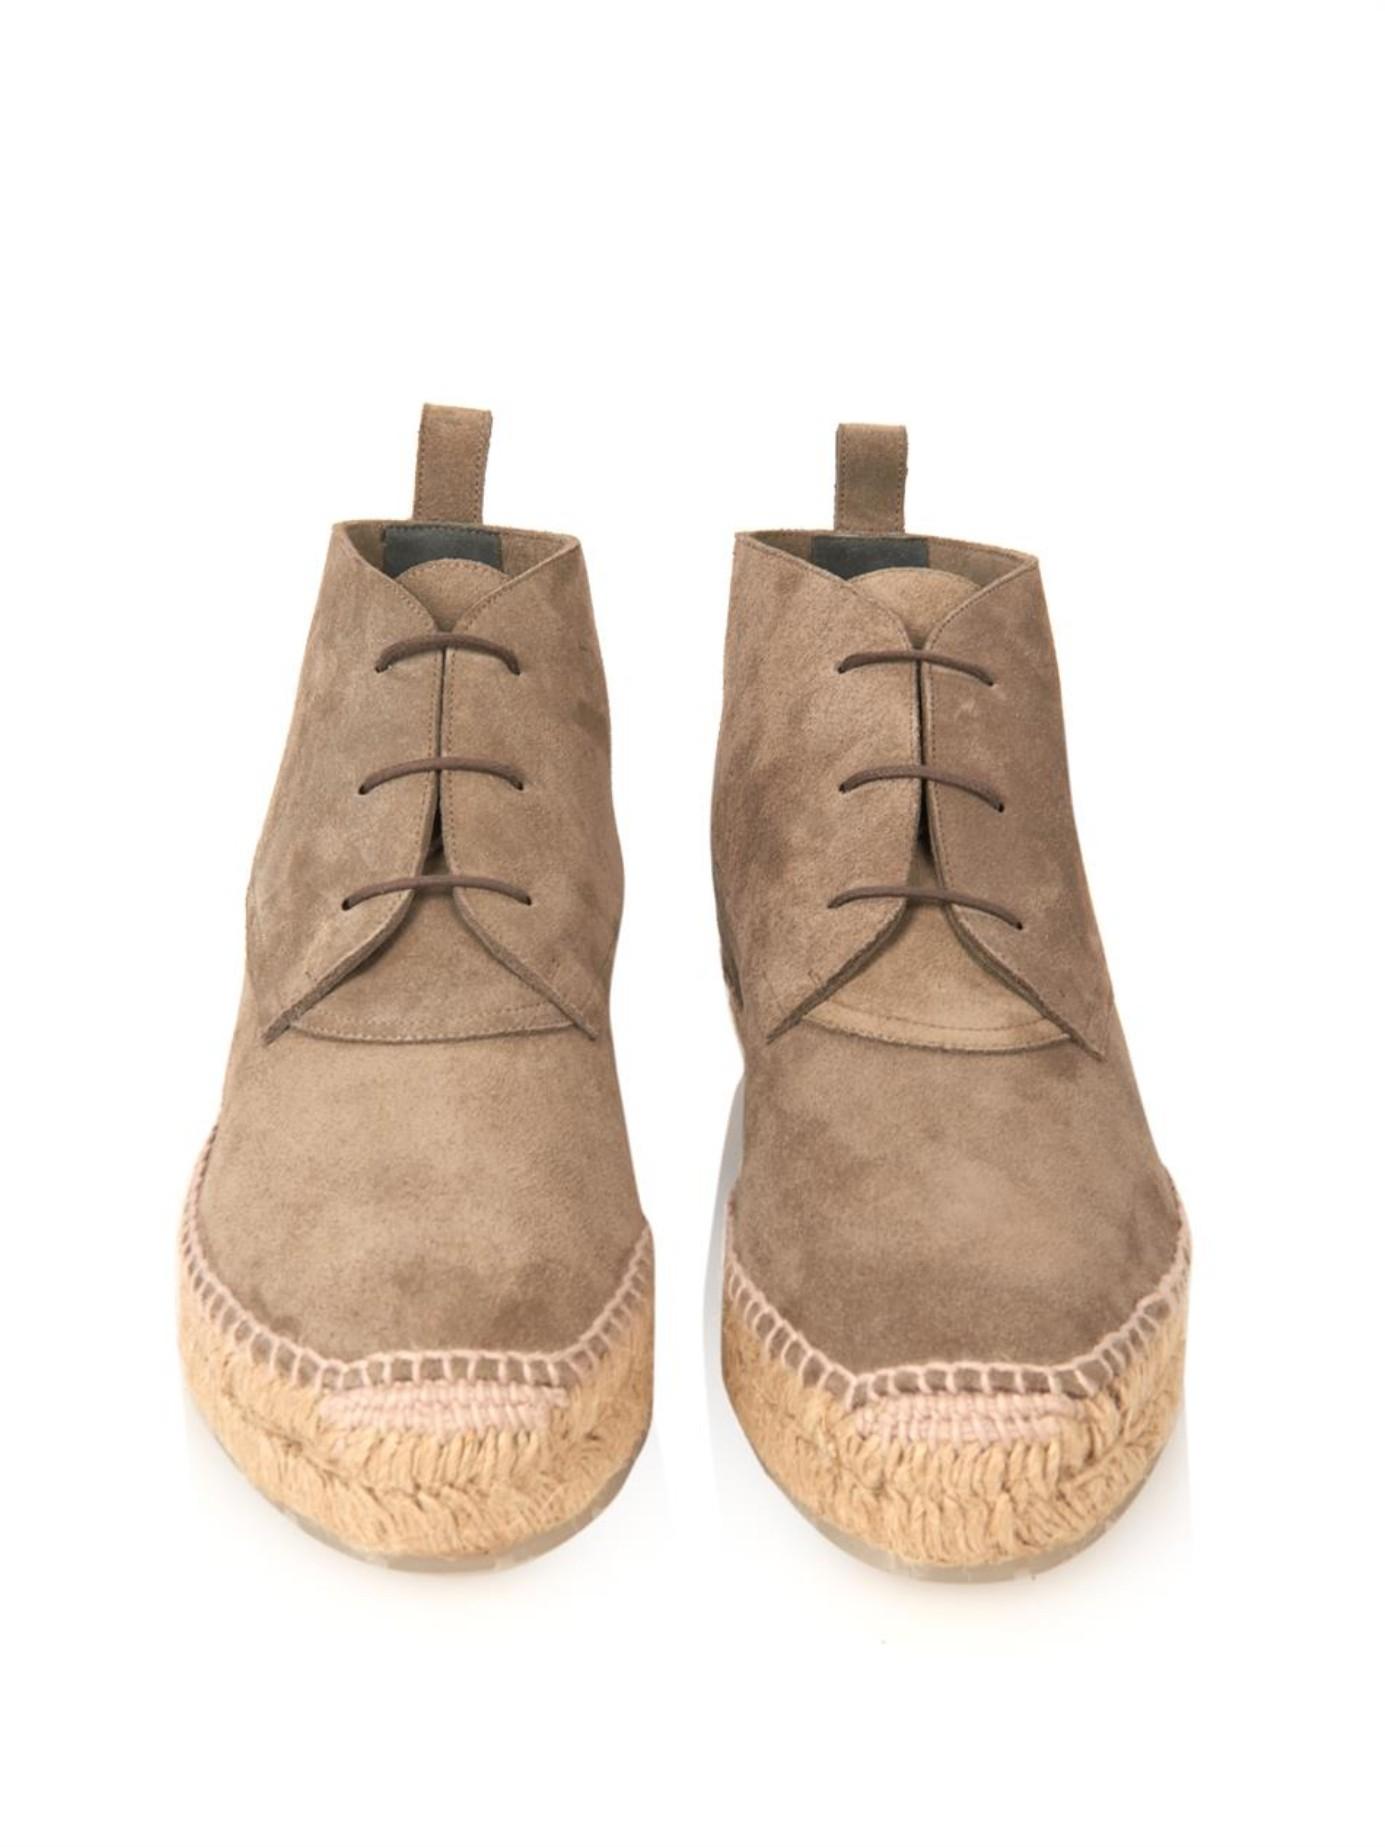 Lyst - Balenciaga Suede Desert Boots in Gray